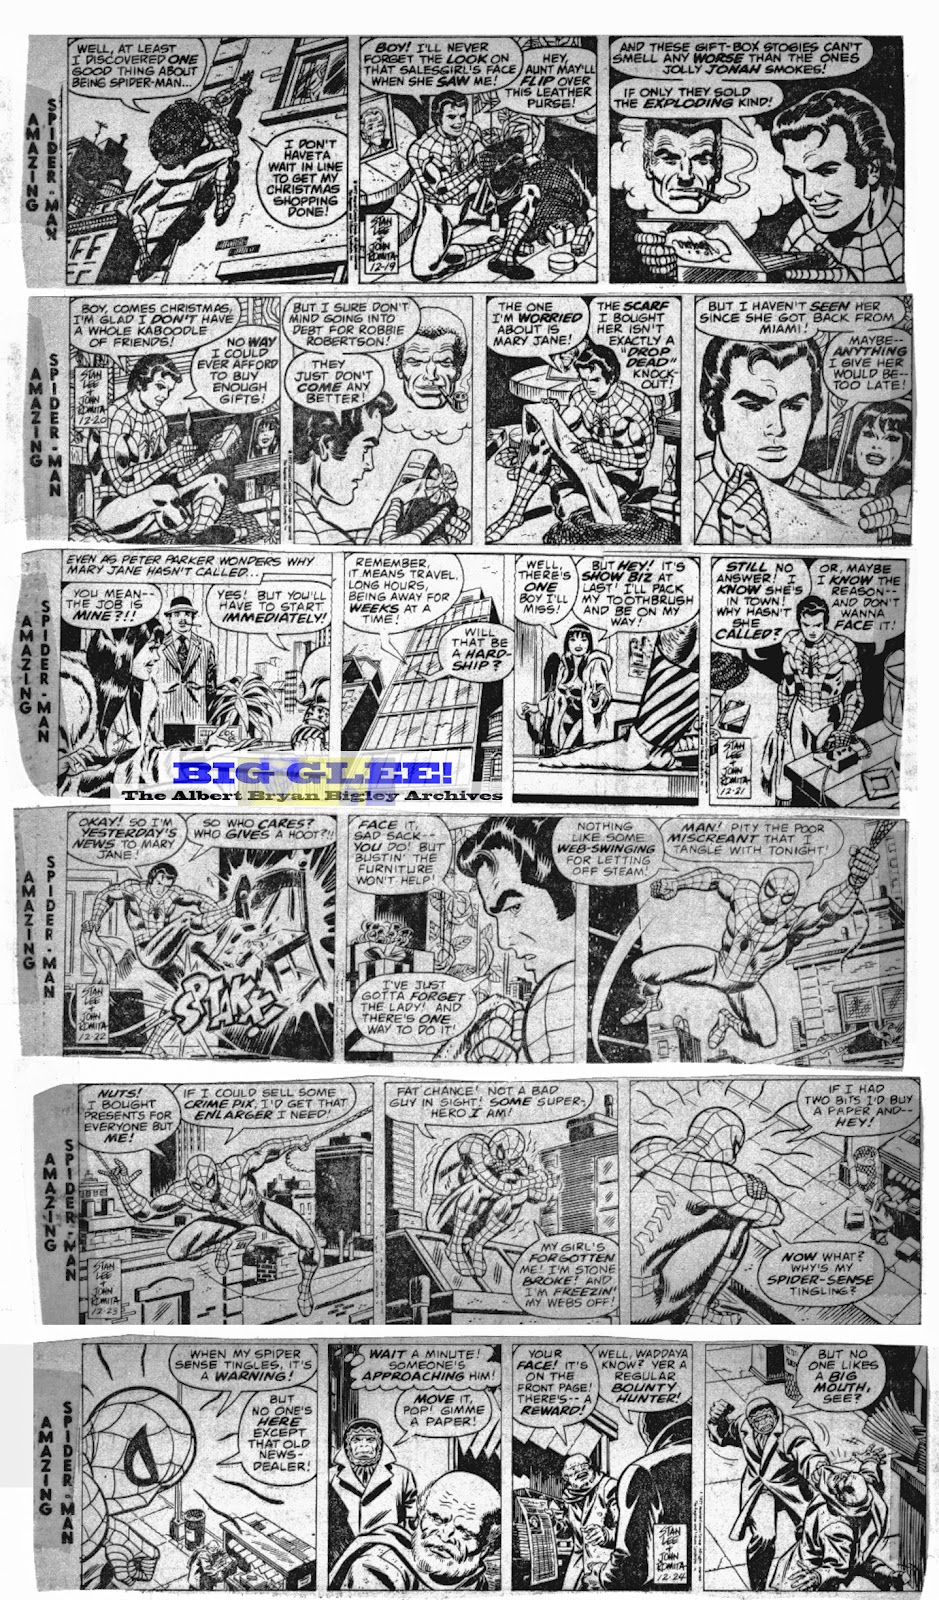 Newspaper Comics - ComicStripFancom